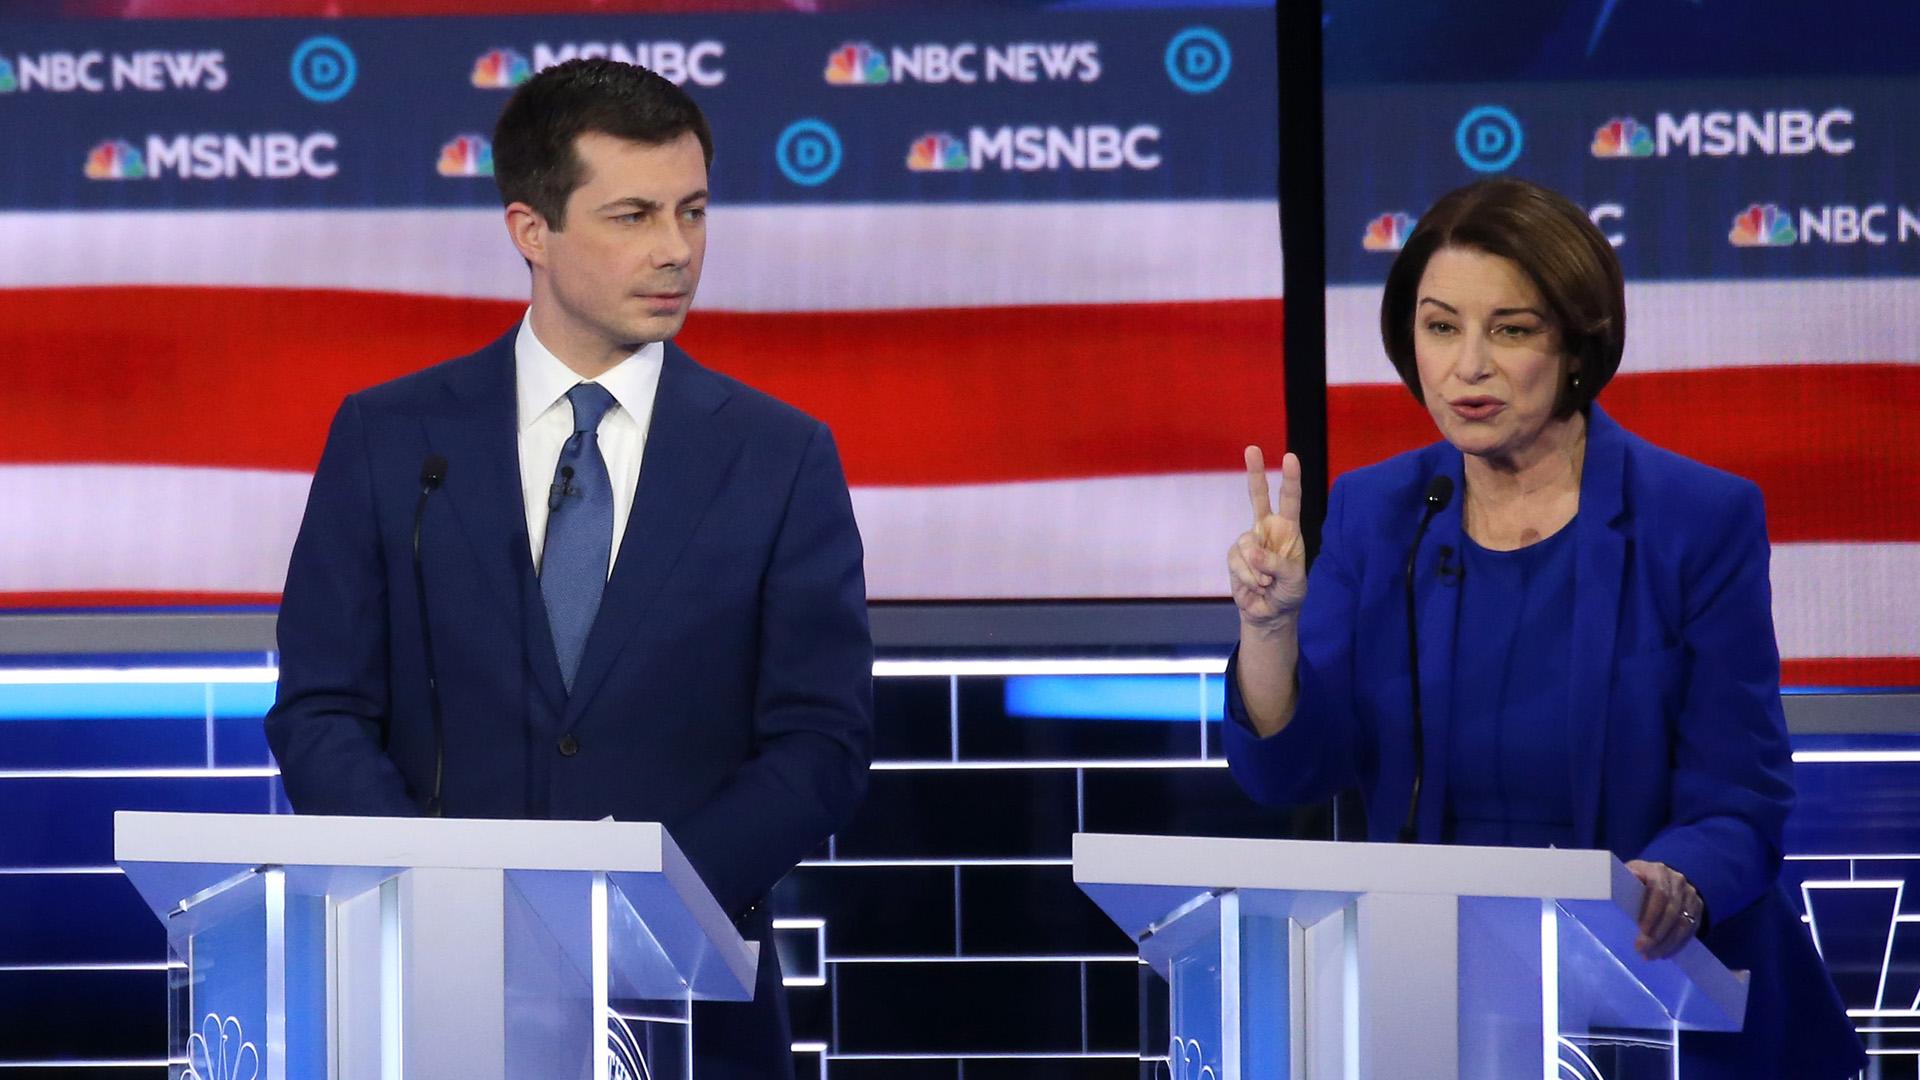 Pete Buttigieg and Amy Klobuchar participate in the Democratic presidential primary debate at Paris Las Vegas on Feb. 19, 2020 in Las Vegas, Nevada.(Credit: Mario Tama/Getty Images)